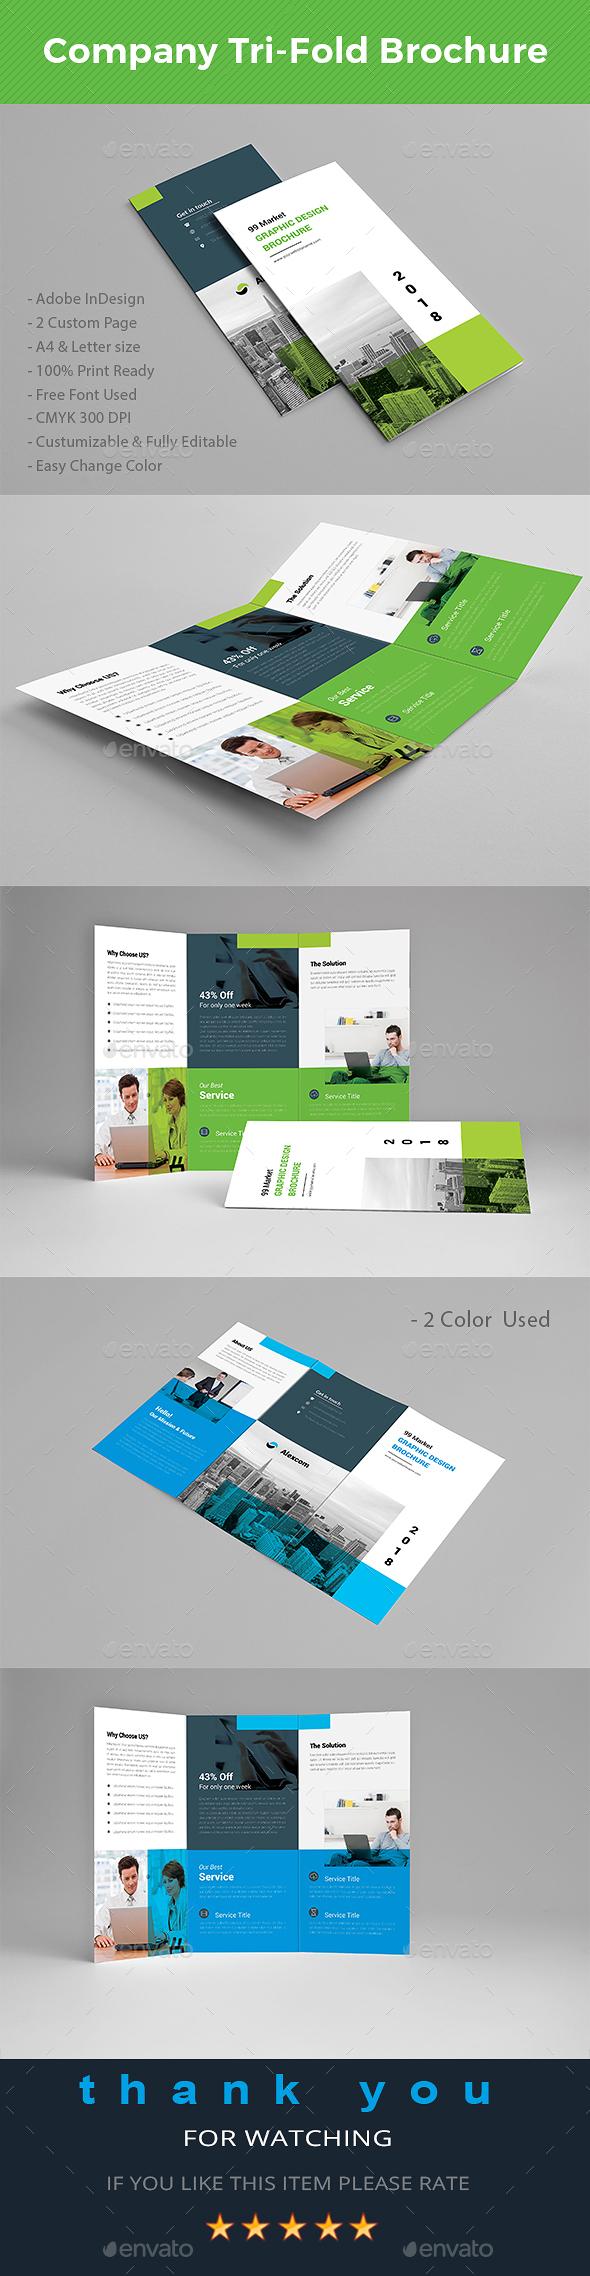 Company Tri-fold Brochure - Brochures Print Templates